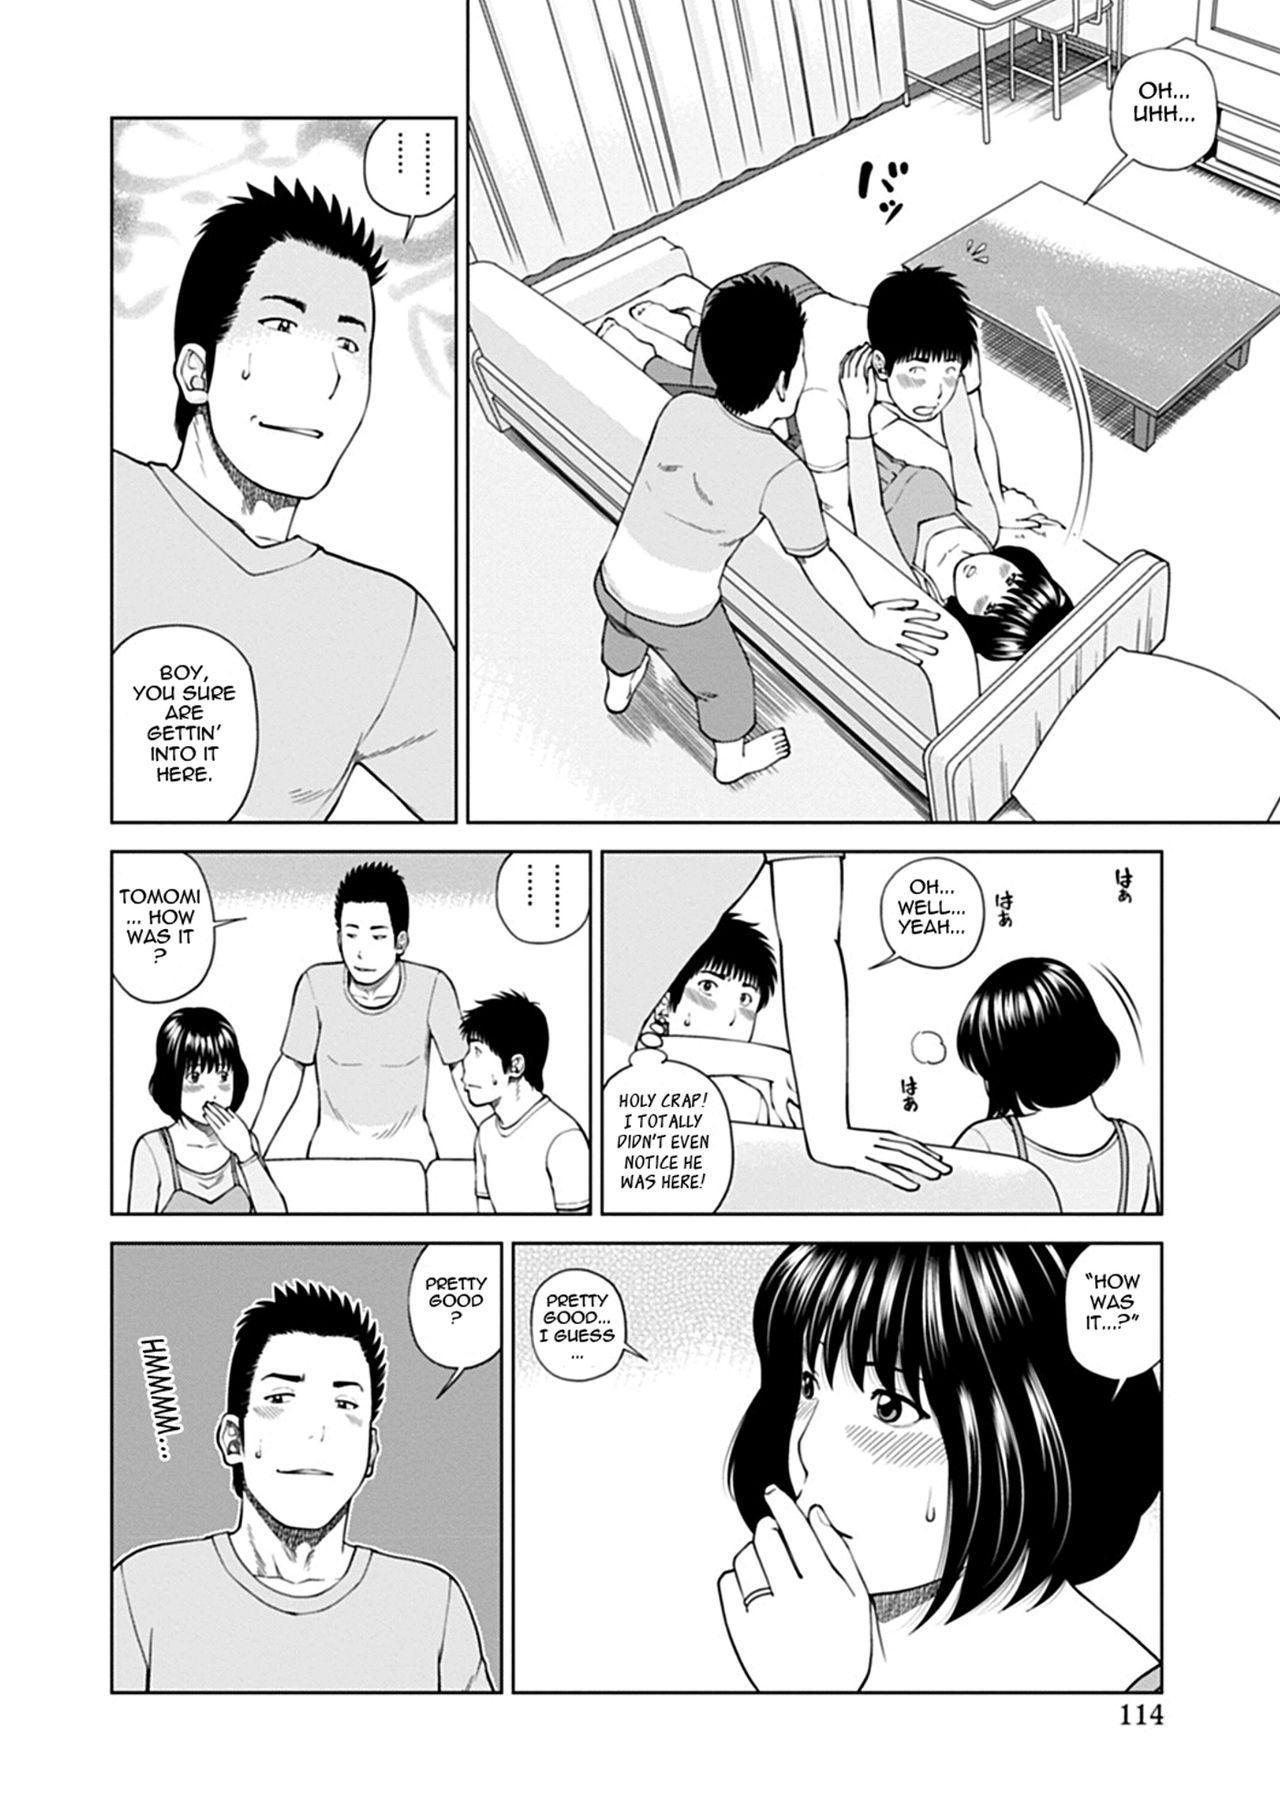 [Kuroki Hidehiko] 36-sai Injuku Sakarizuma | 36-Year-Old Randy Mature Wife [English] {Tadanohito} [Digital] [Uncensored] 109